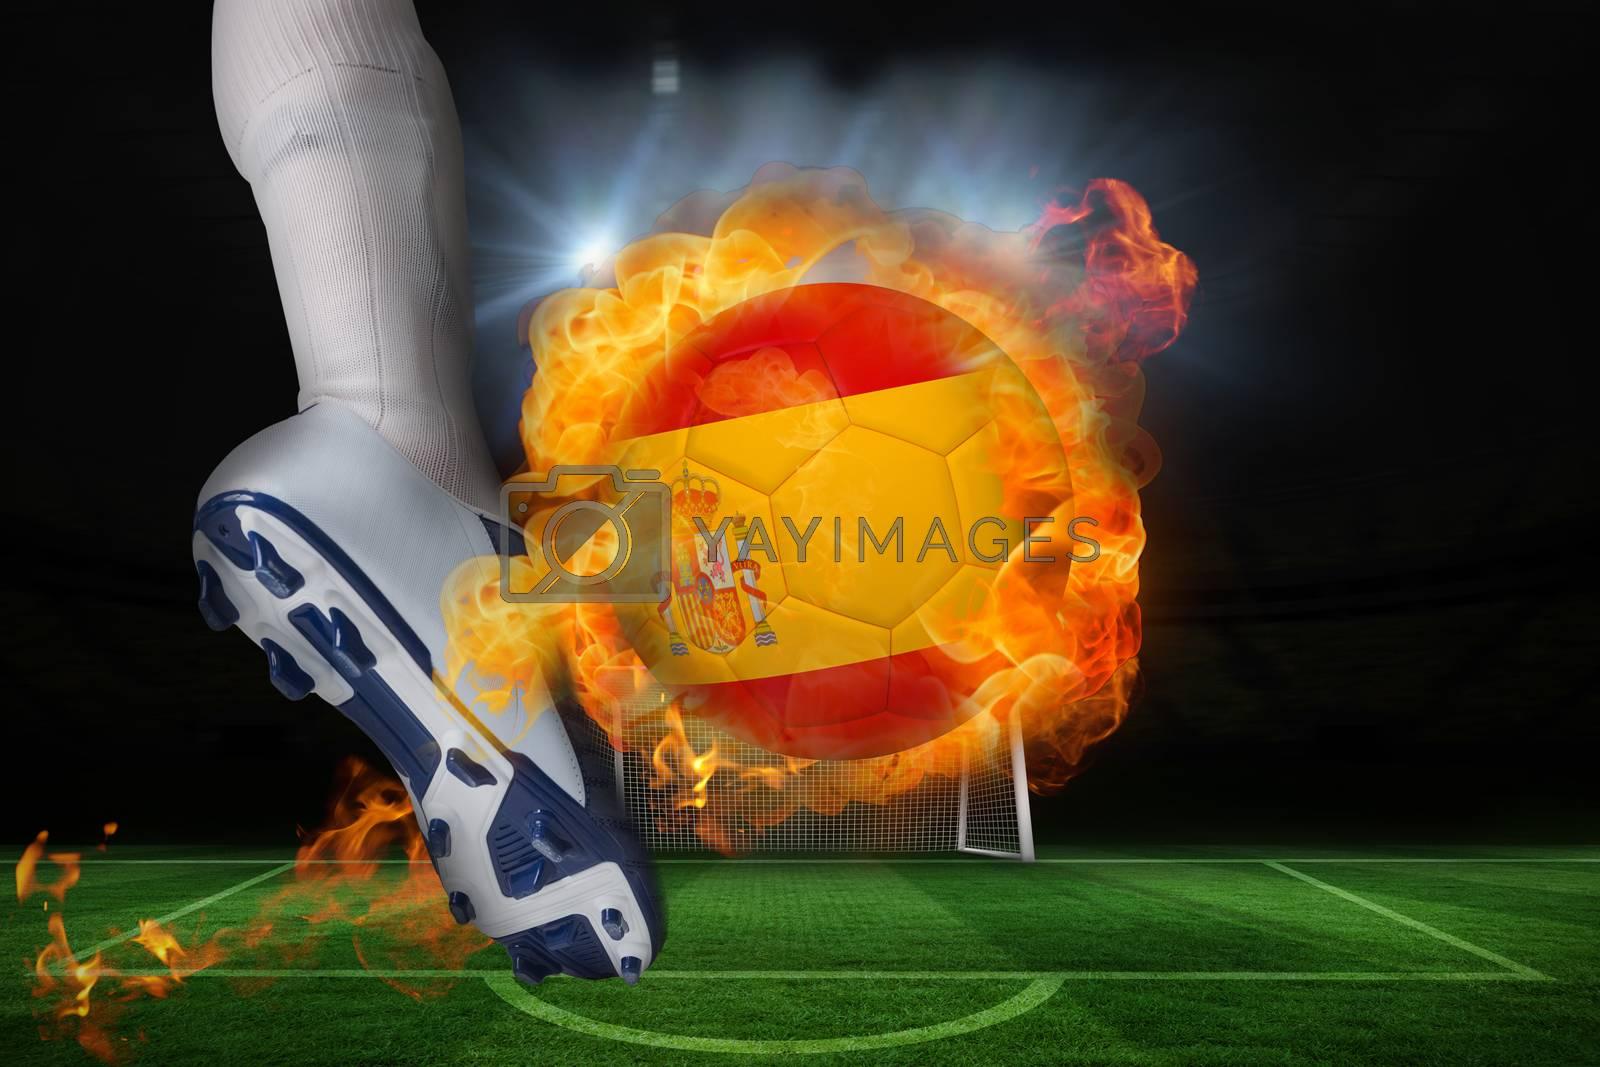 Football player kicking flaming spain flag ball by Wavebreakmedia